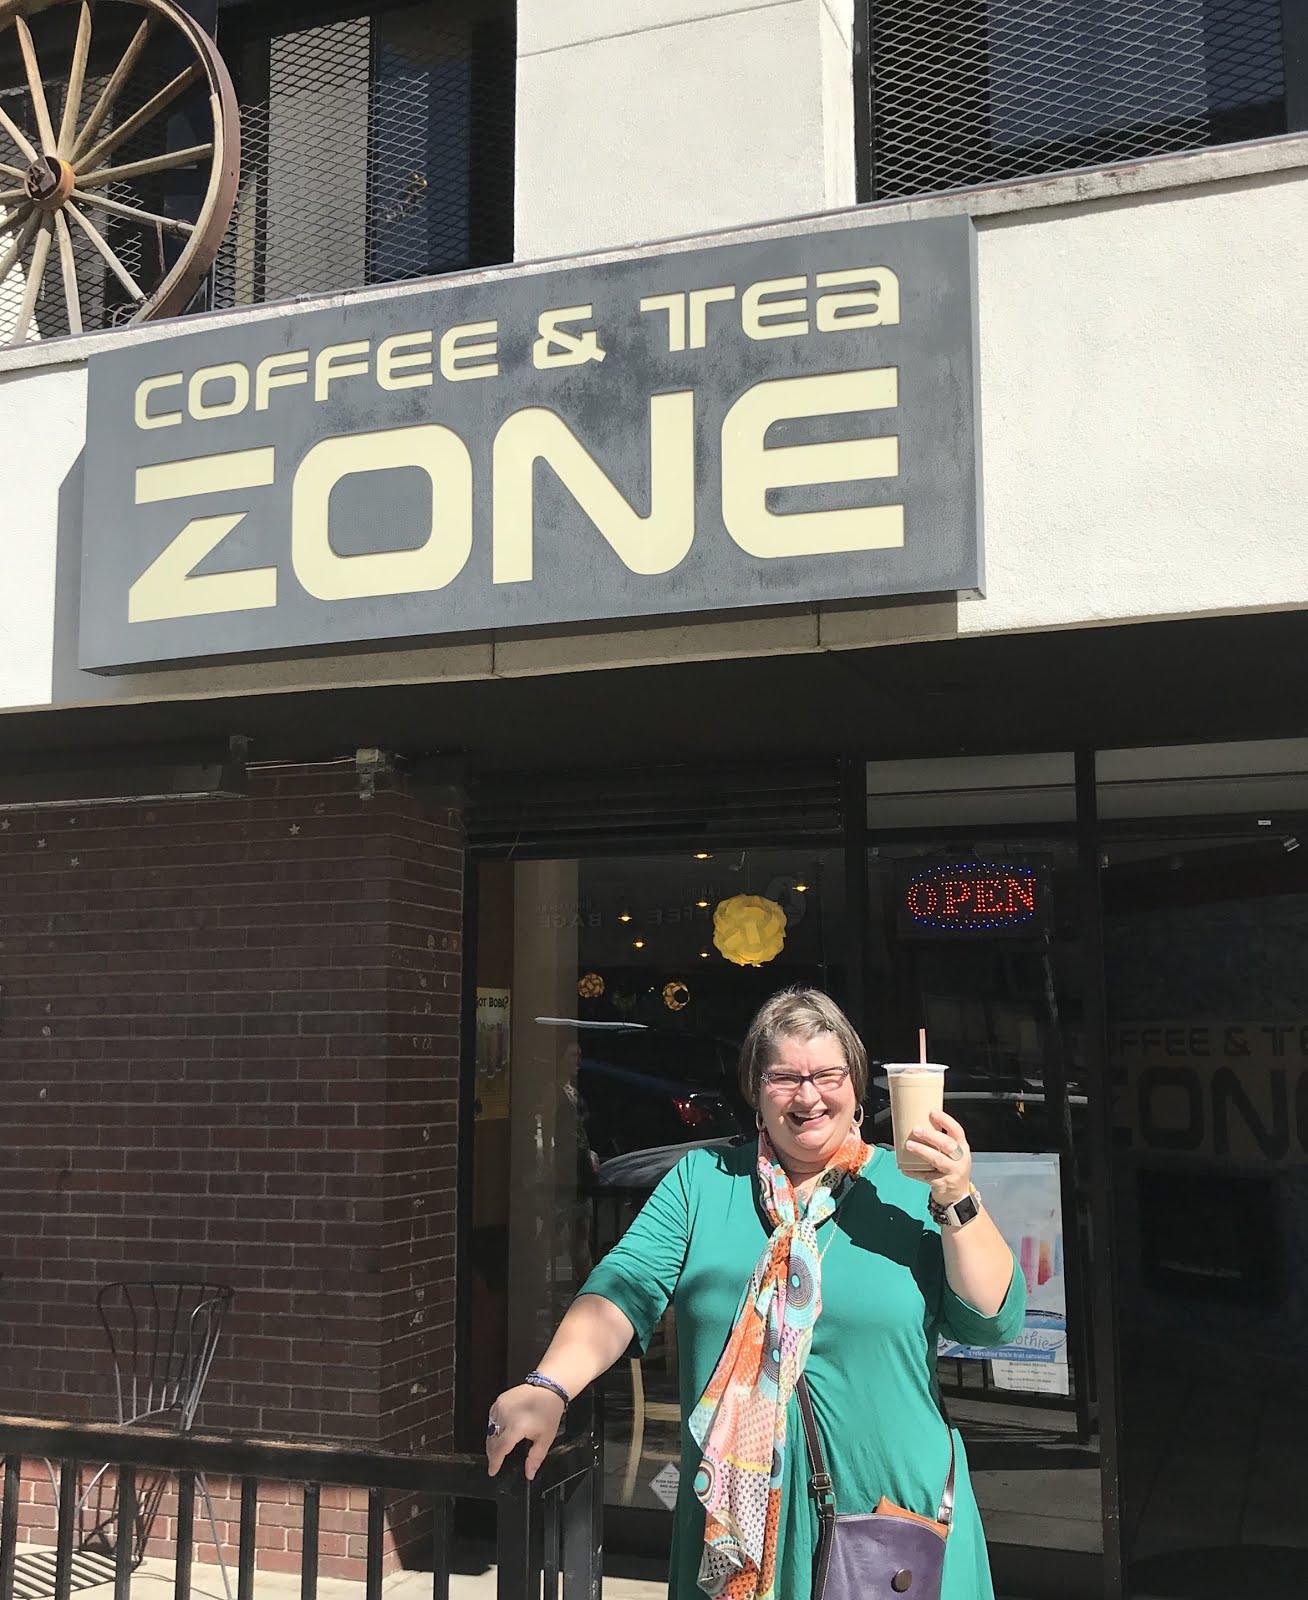 Coffee & Tea Zone, Colorado Springs, CO 2018